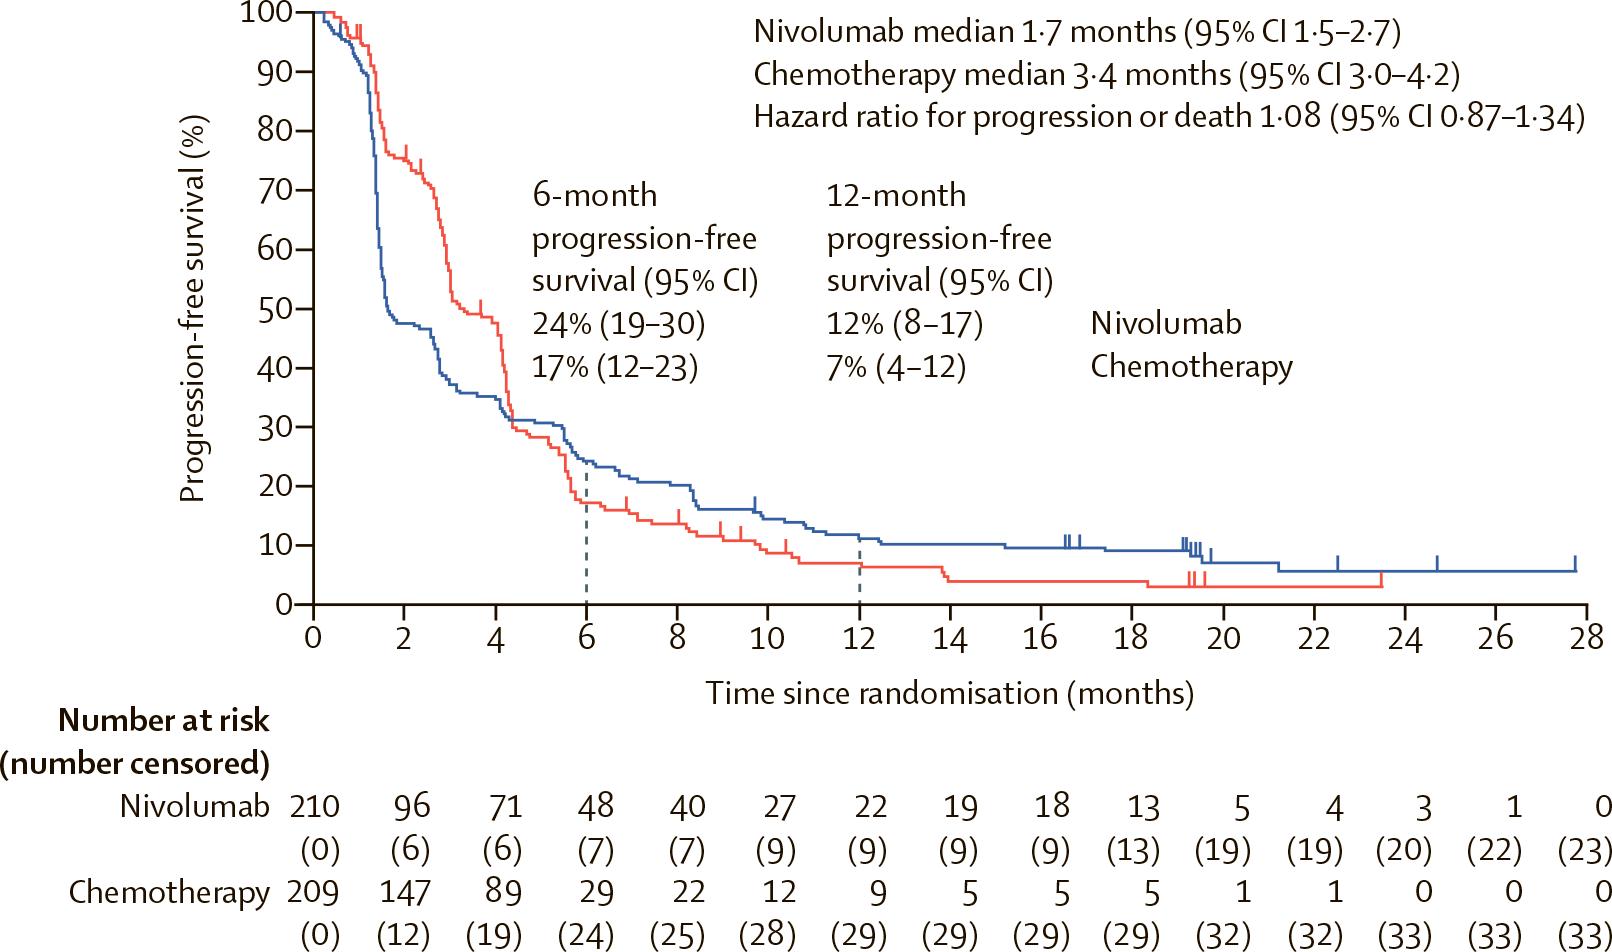 nct02569242 results 04 - Рак пищевода: назначайте «Опдиво» вместо химиотерапии